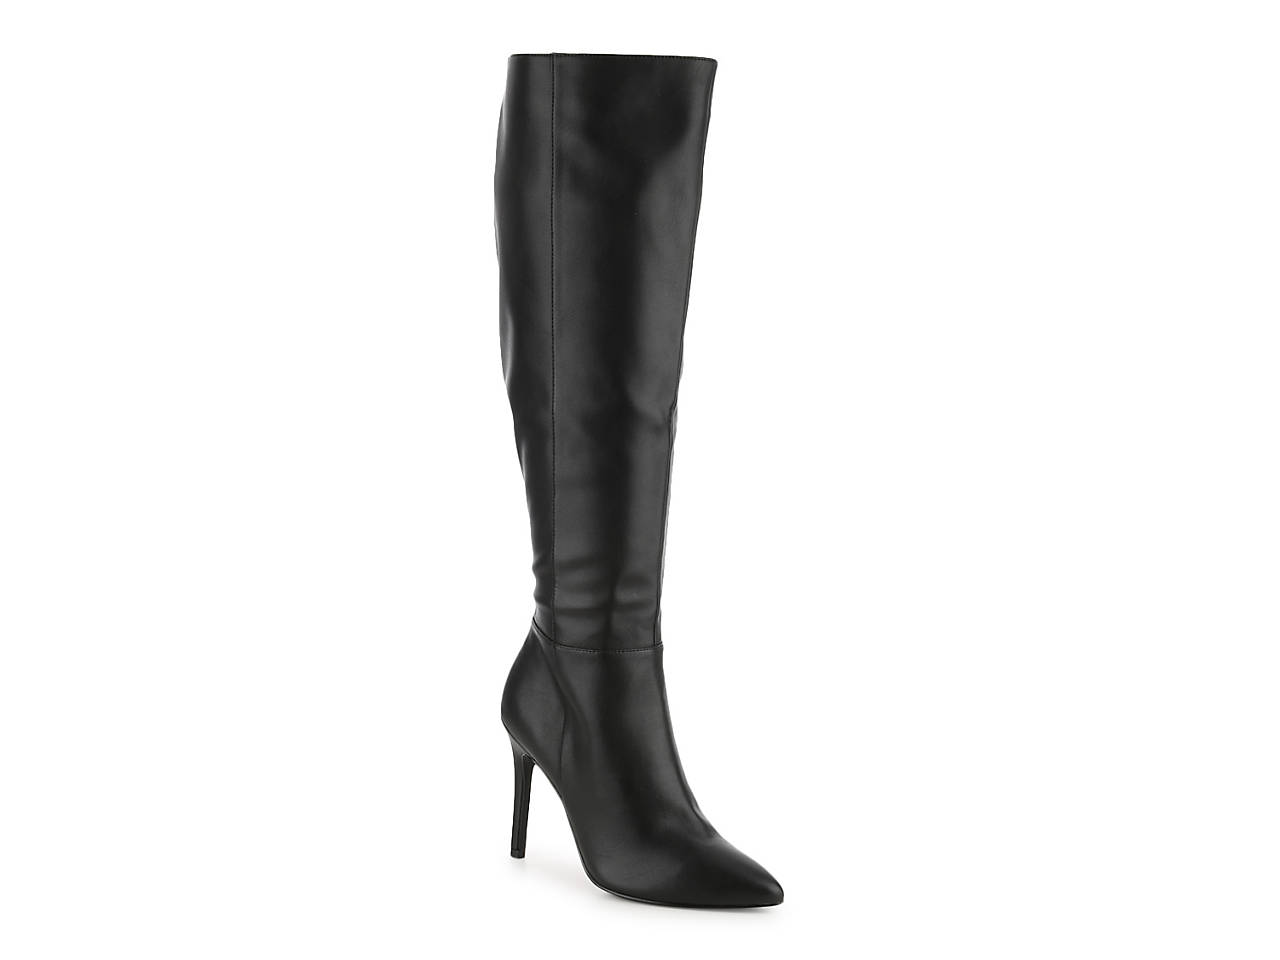 b2ac82f77a21 Charles by Charles David Daya Boot Women s Shoes